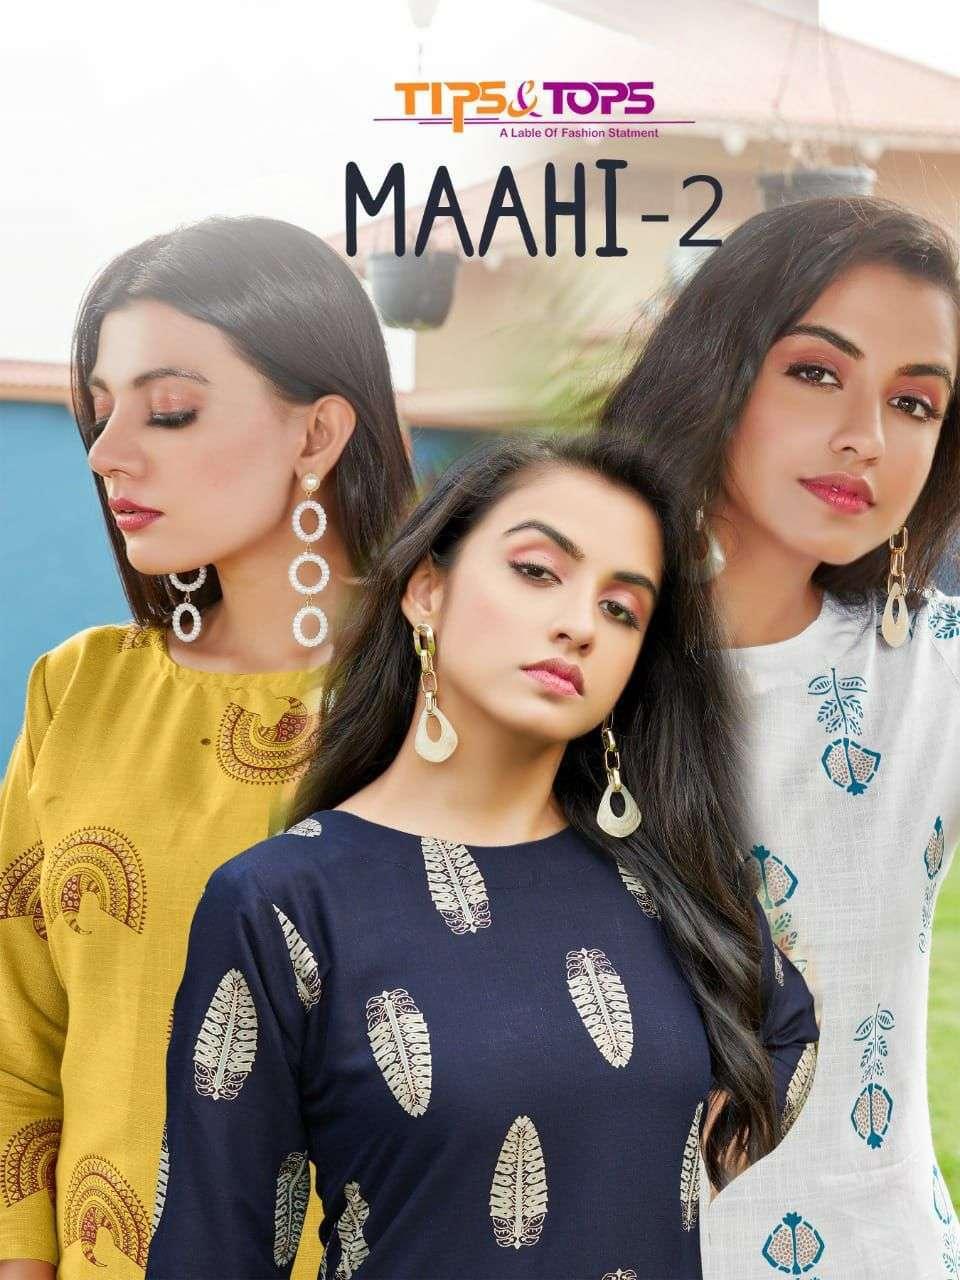 tips & tops maahi vol 2 series 01-05 Heavy Reyon Slub Foil Print kurti